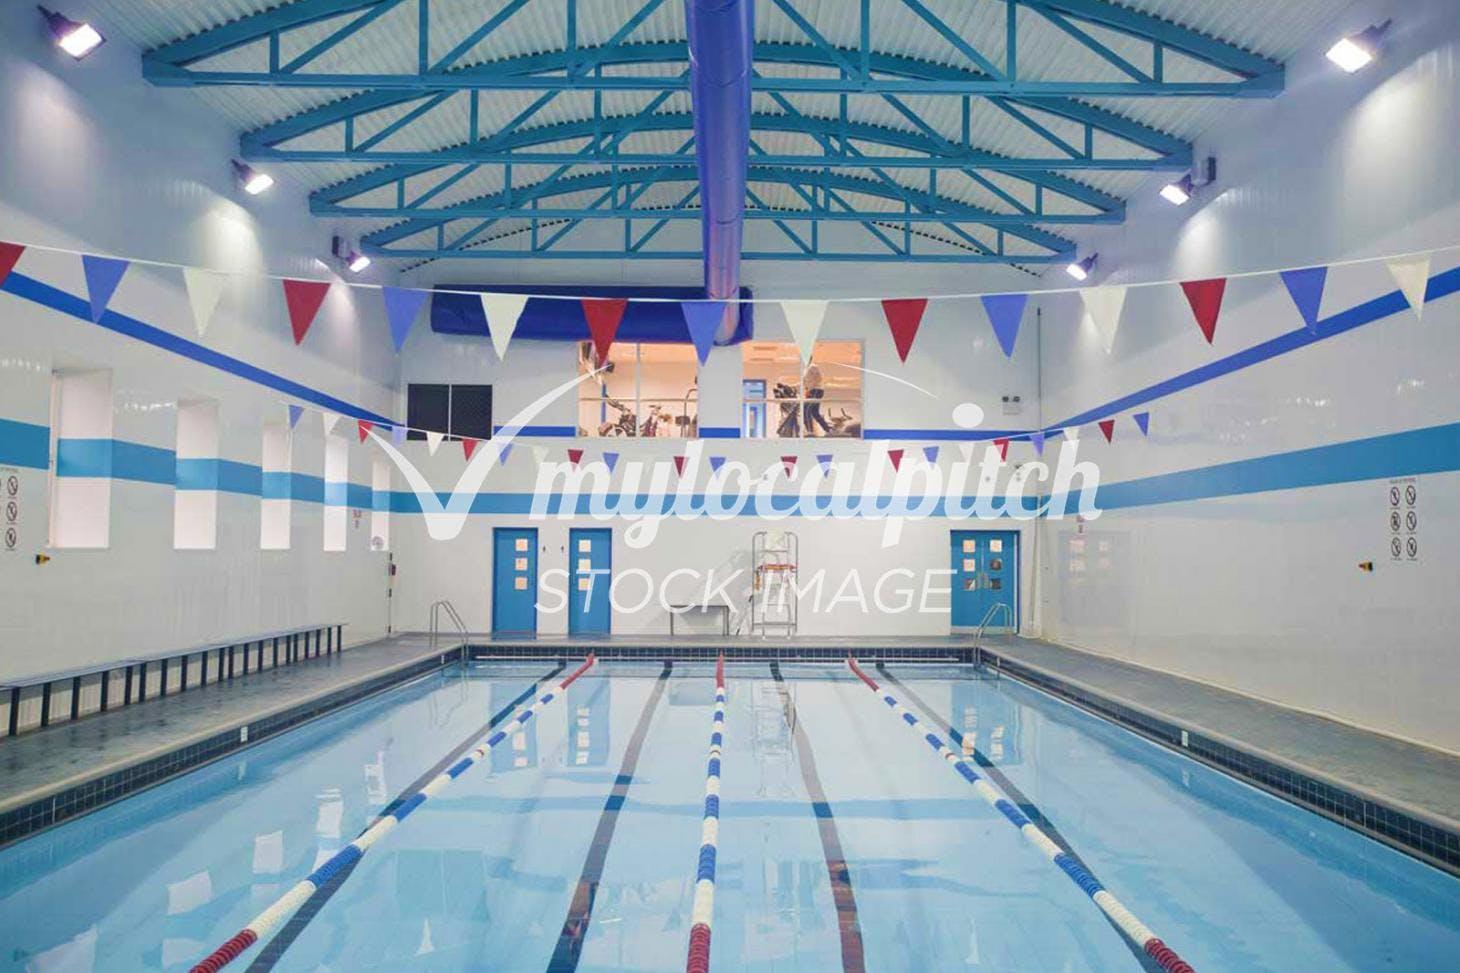 Eltham Centre Indoor swimming pool